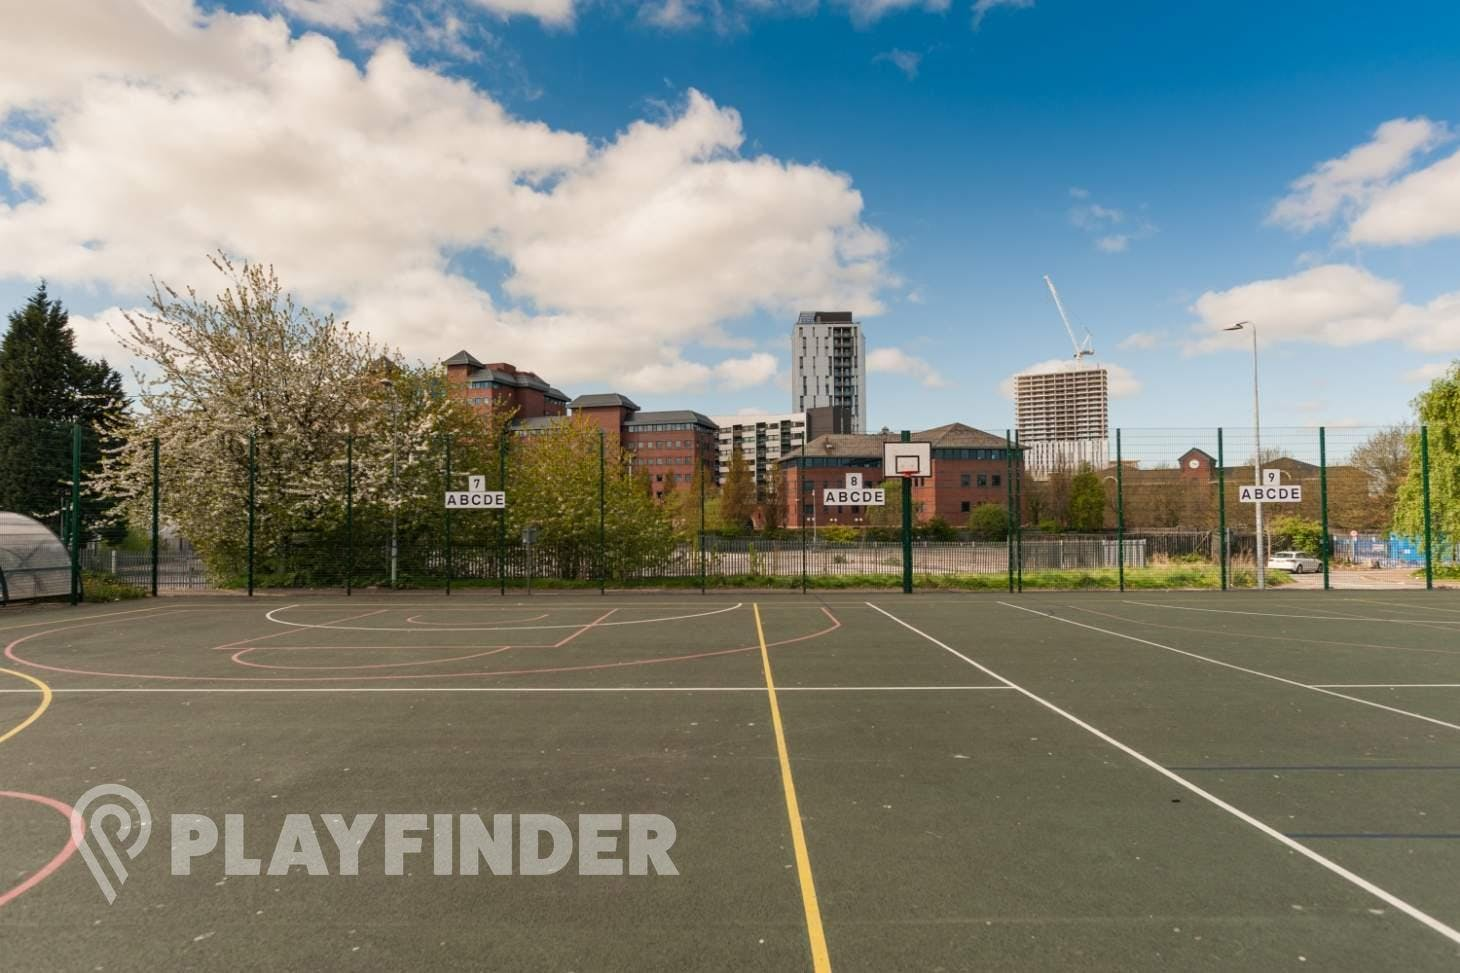 Oasis Academy MediaCityUK Outdoor | Hard (macadam) netball court